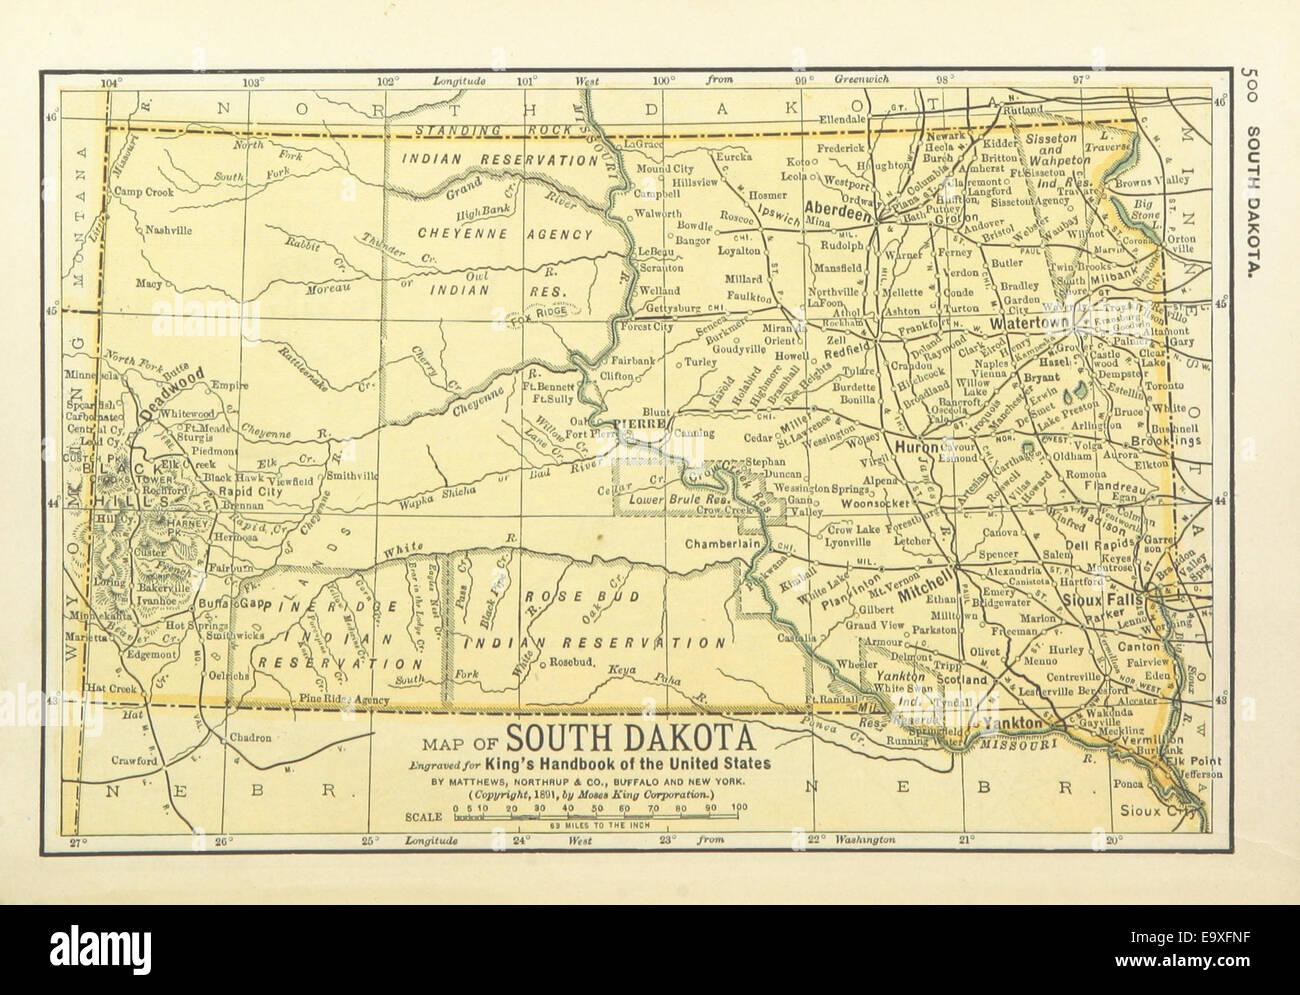 Us Maps 1891 P502 Map Of South Dakota Stock Photo 74956491 Alamy